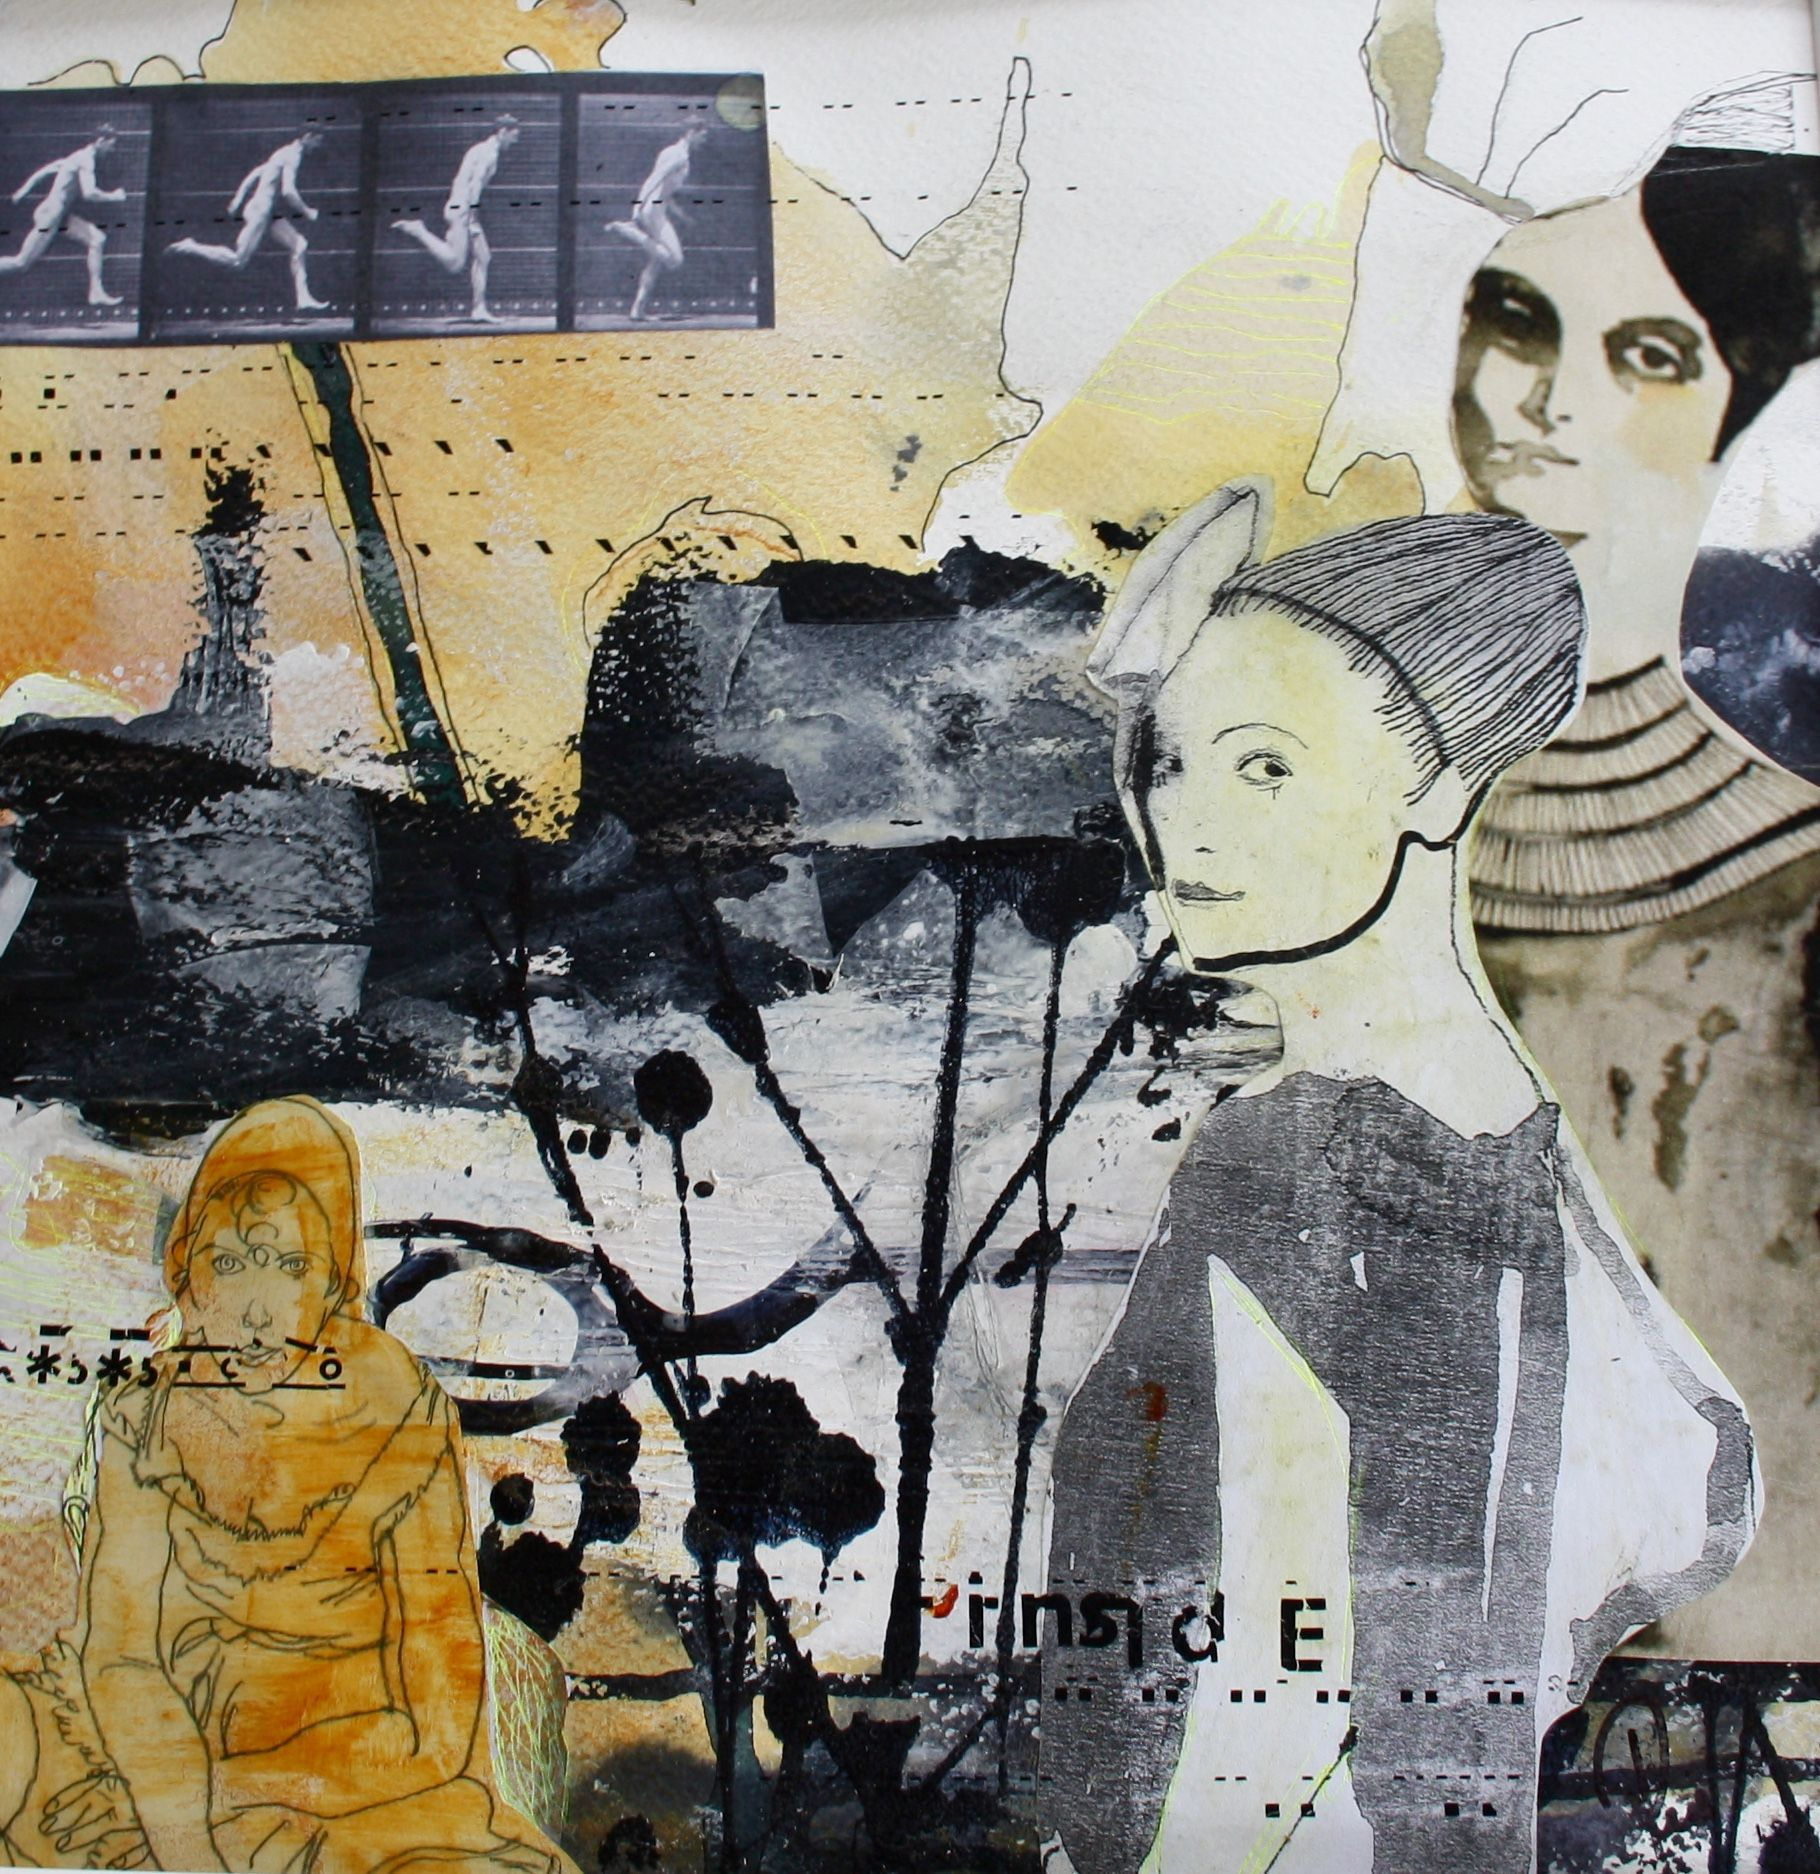 Mennesker Maleri Collage Abstrakt Art Udstillinger Kursus Akrylmaleri Rie Brodsgard Kolding Galleri Malerier Abstrakt Akrylmalerier